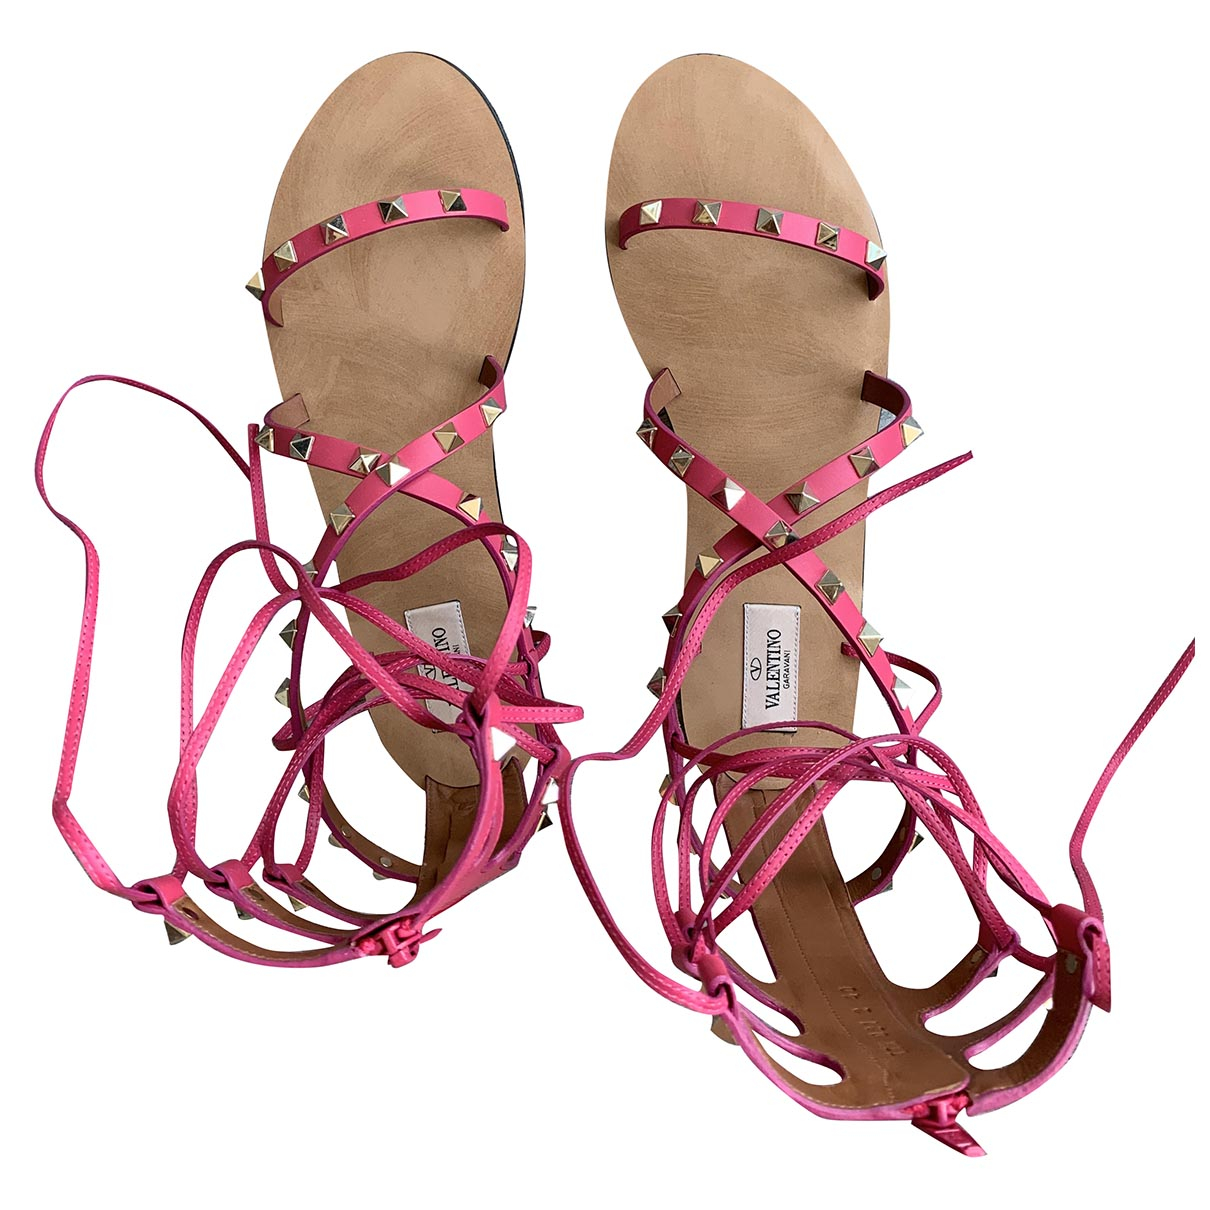 Valentino Garavani Rockstud Pink Leather Sandals for Women 40 EU